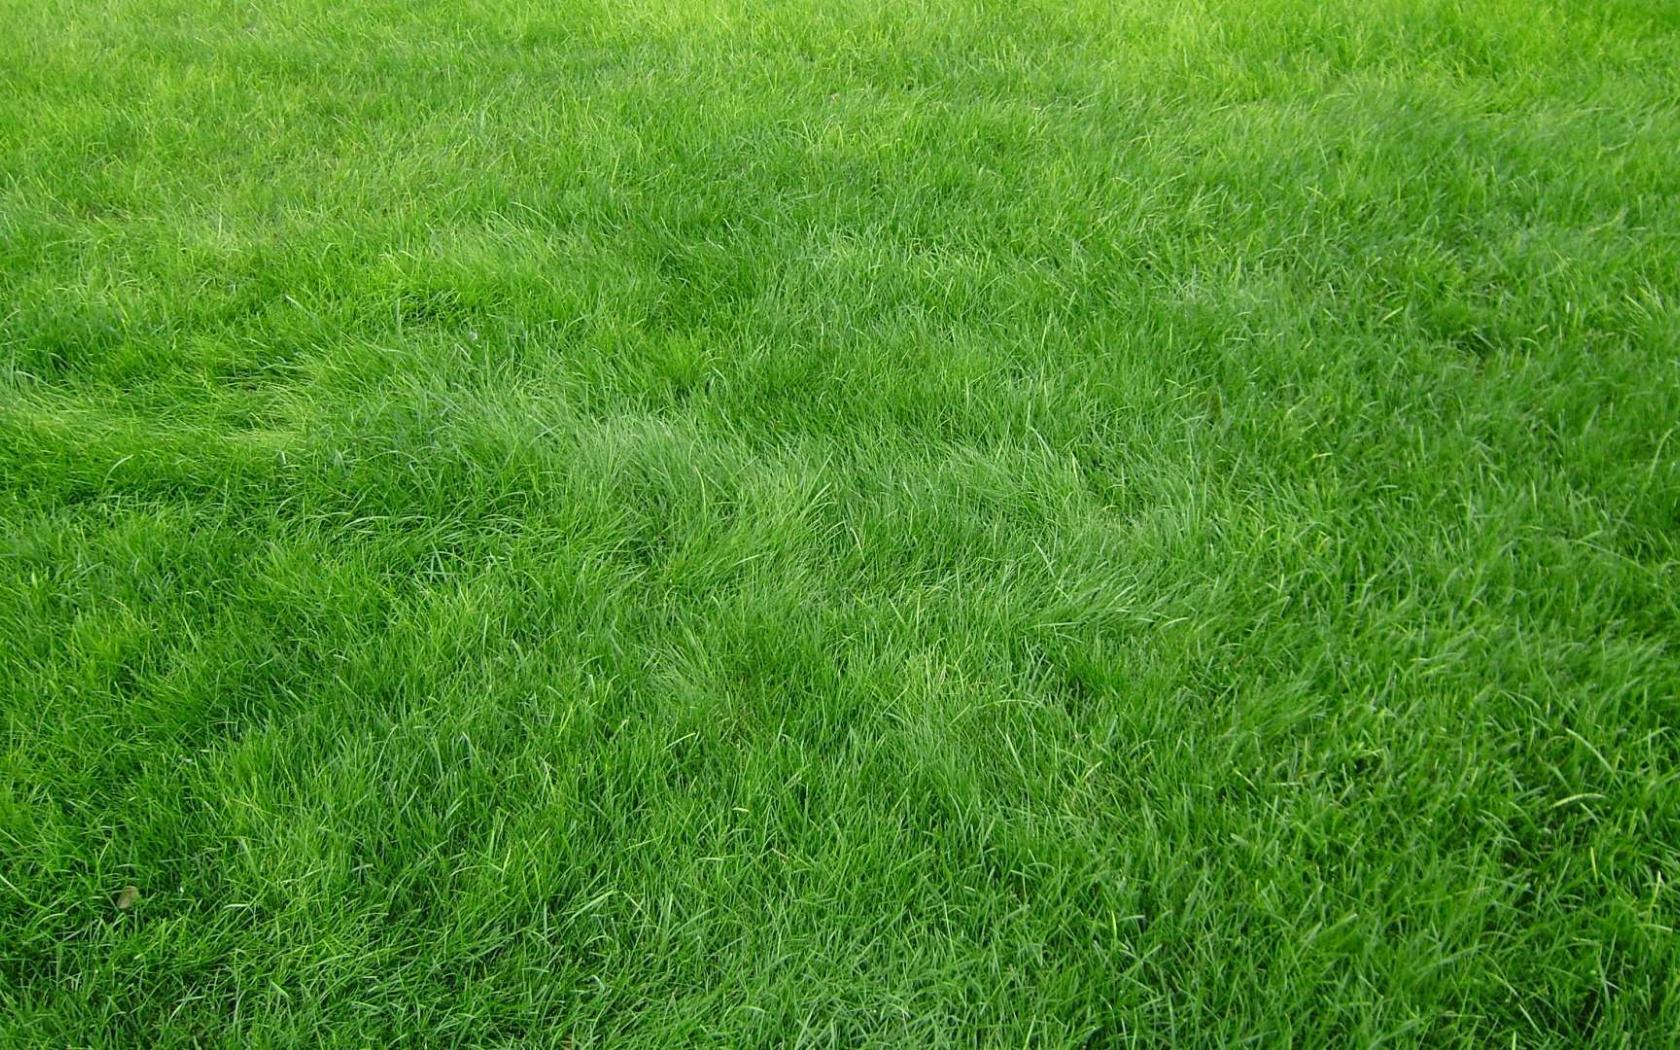 Free Download Wallpaper Grain Grass Field Green Hd Wallpaper 1080p